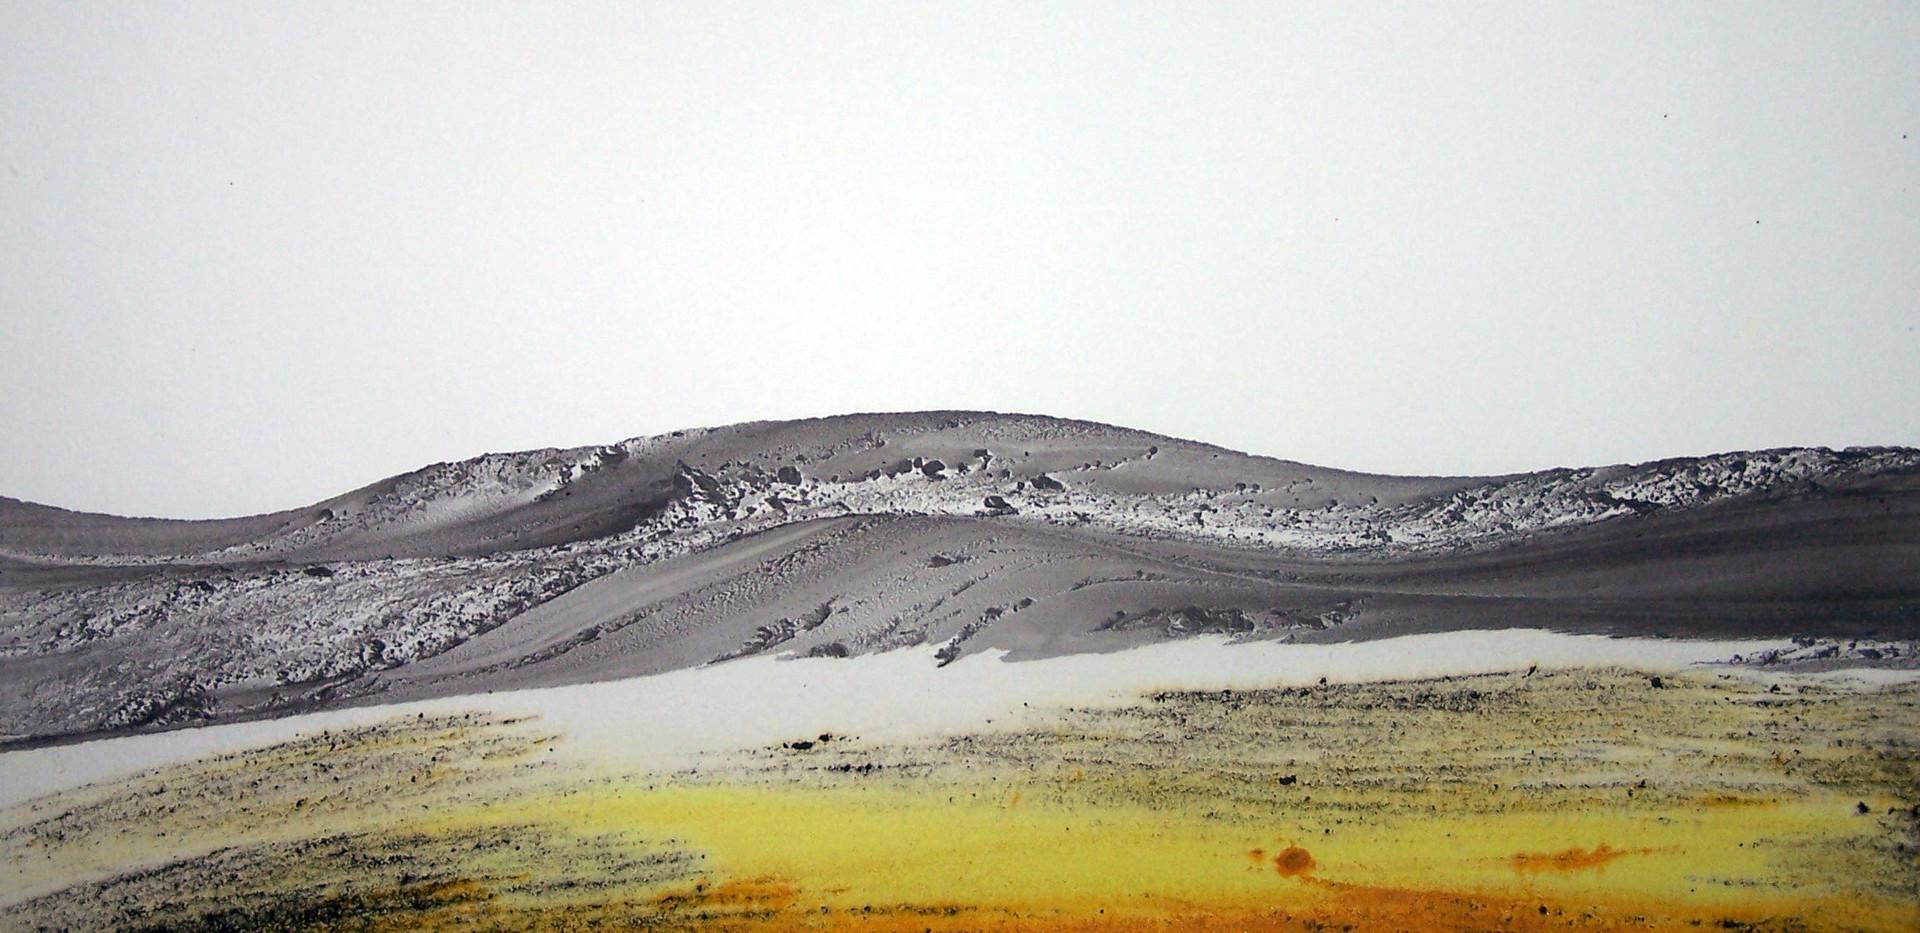 Aharon Gluska, 25 x 30 cm, mixed media